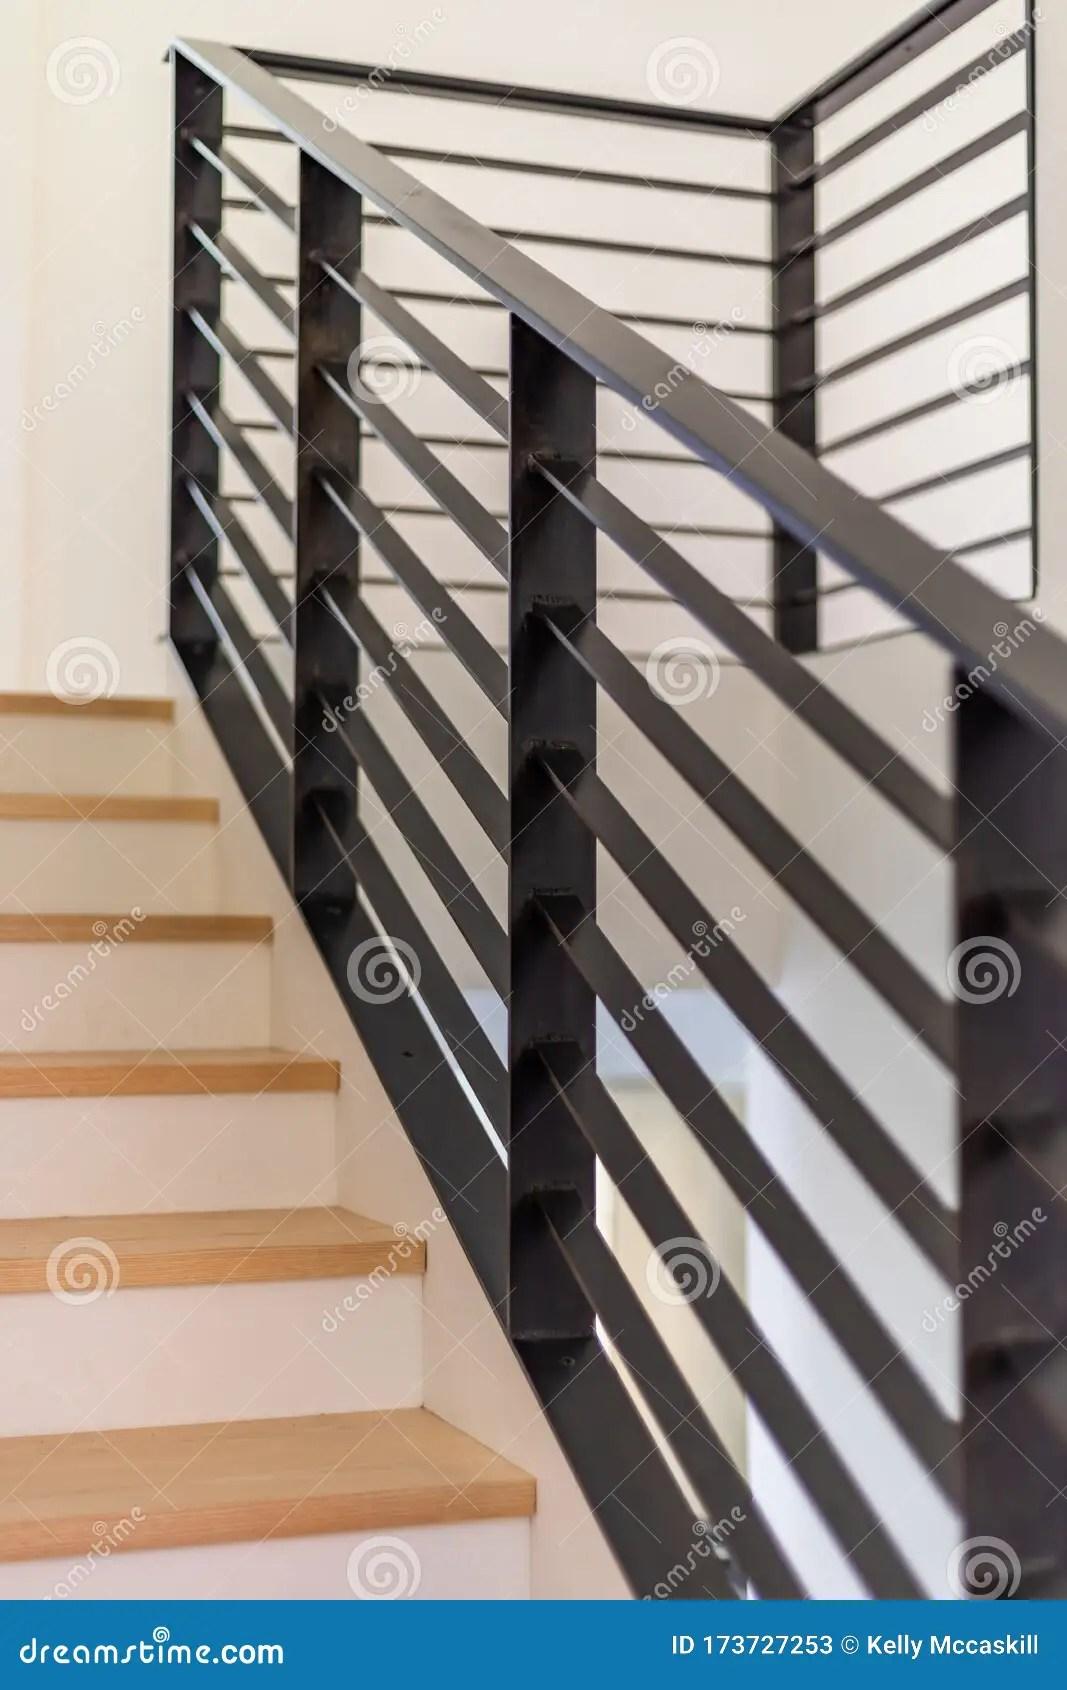 Custom Black Metal Stair Railing Stock Image Image Of Detail | Modern Black Stair Railing | Horizontal | Aluminum | Modern Style | Dark Grey | Matte Black